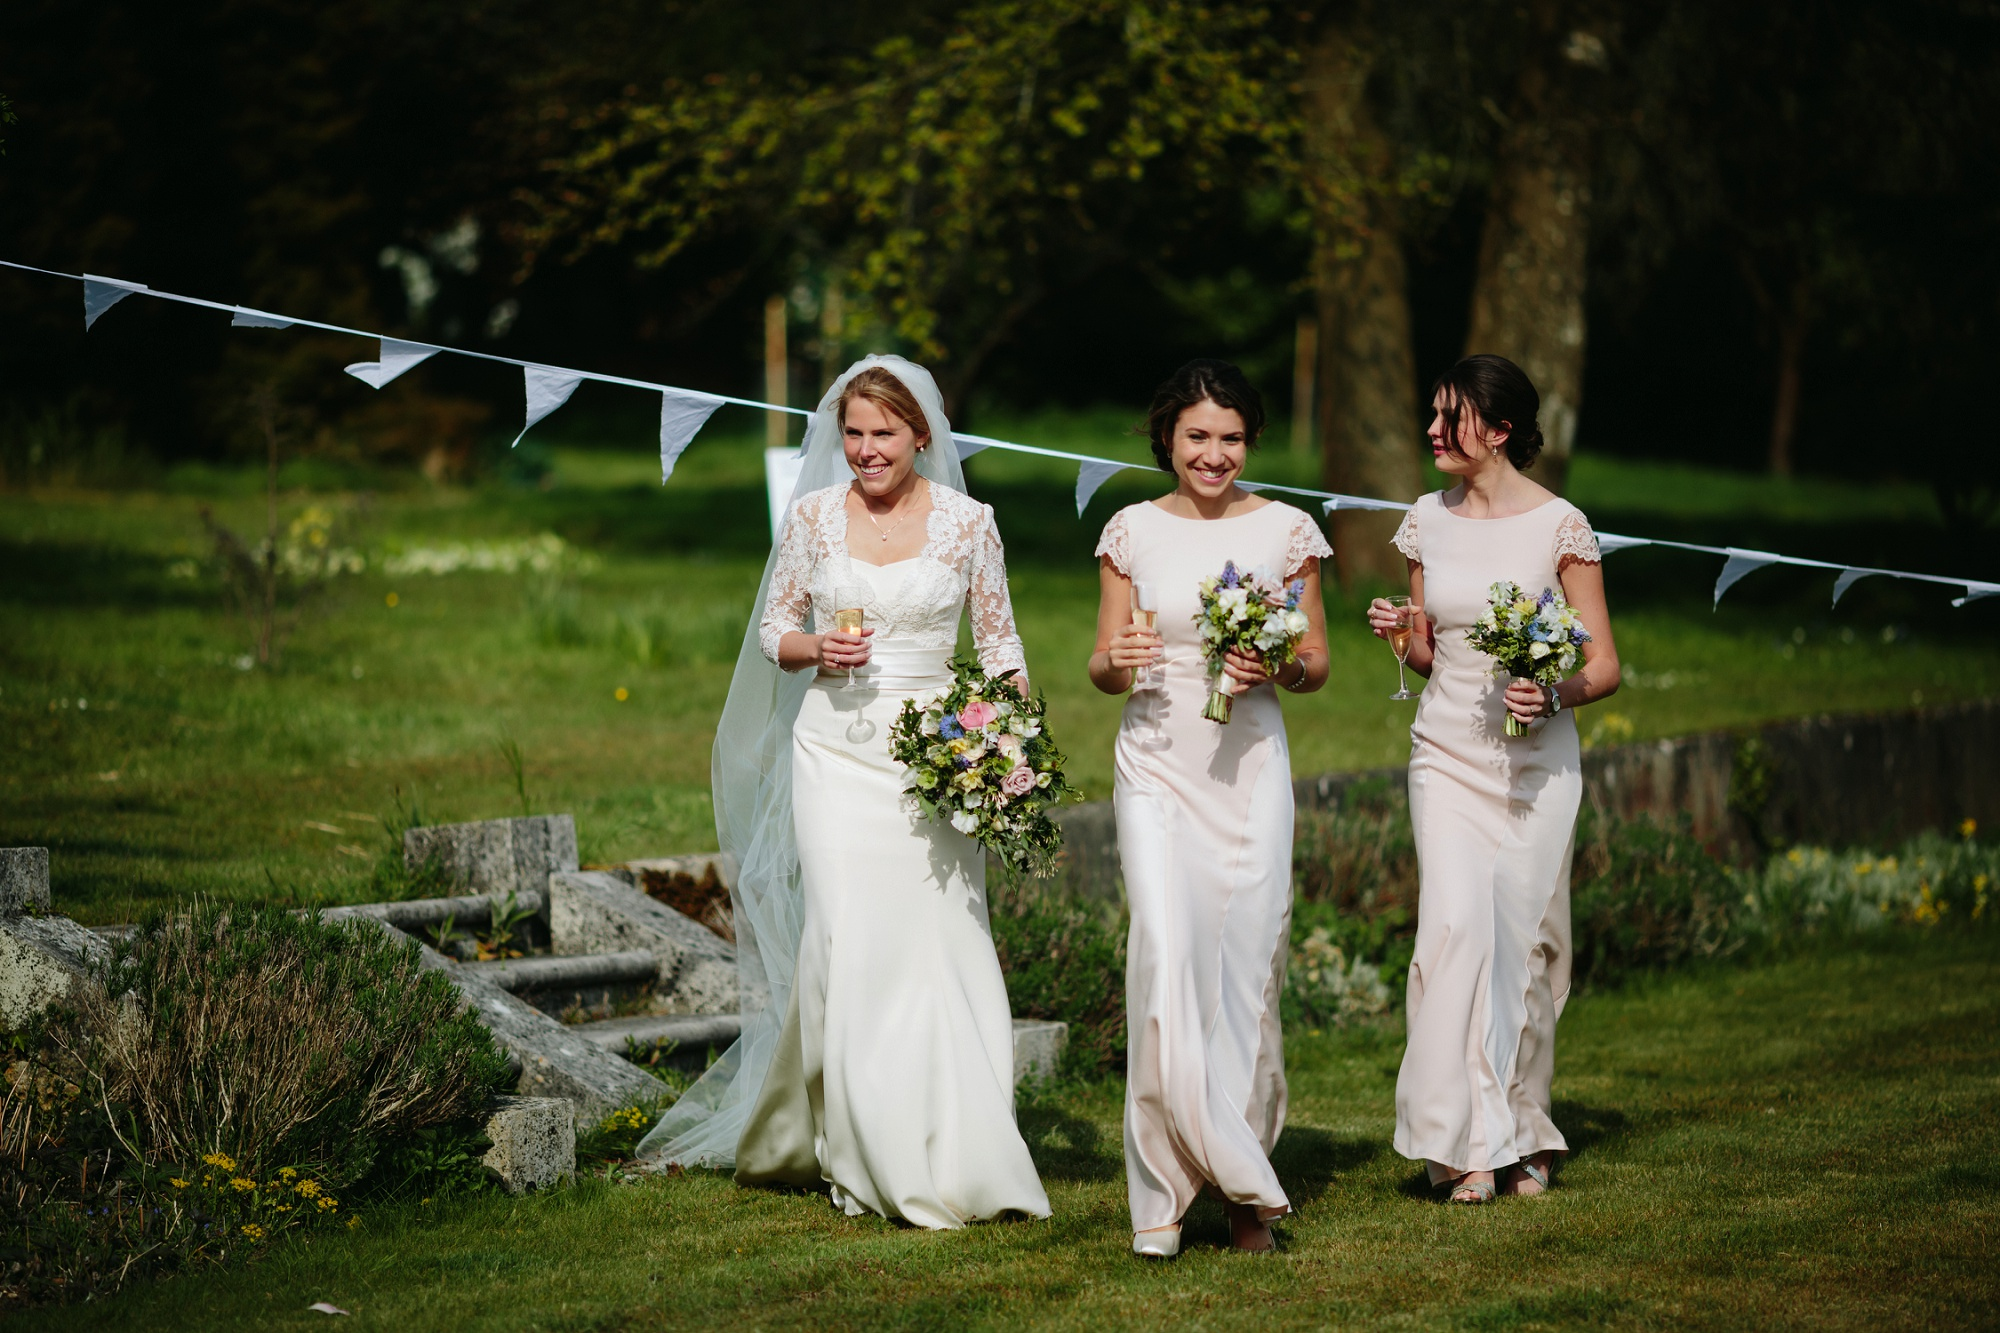 ownhams House Wedding